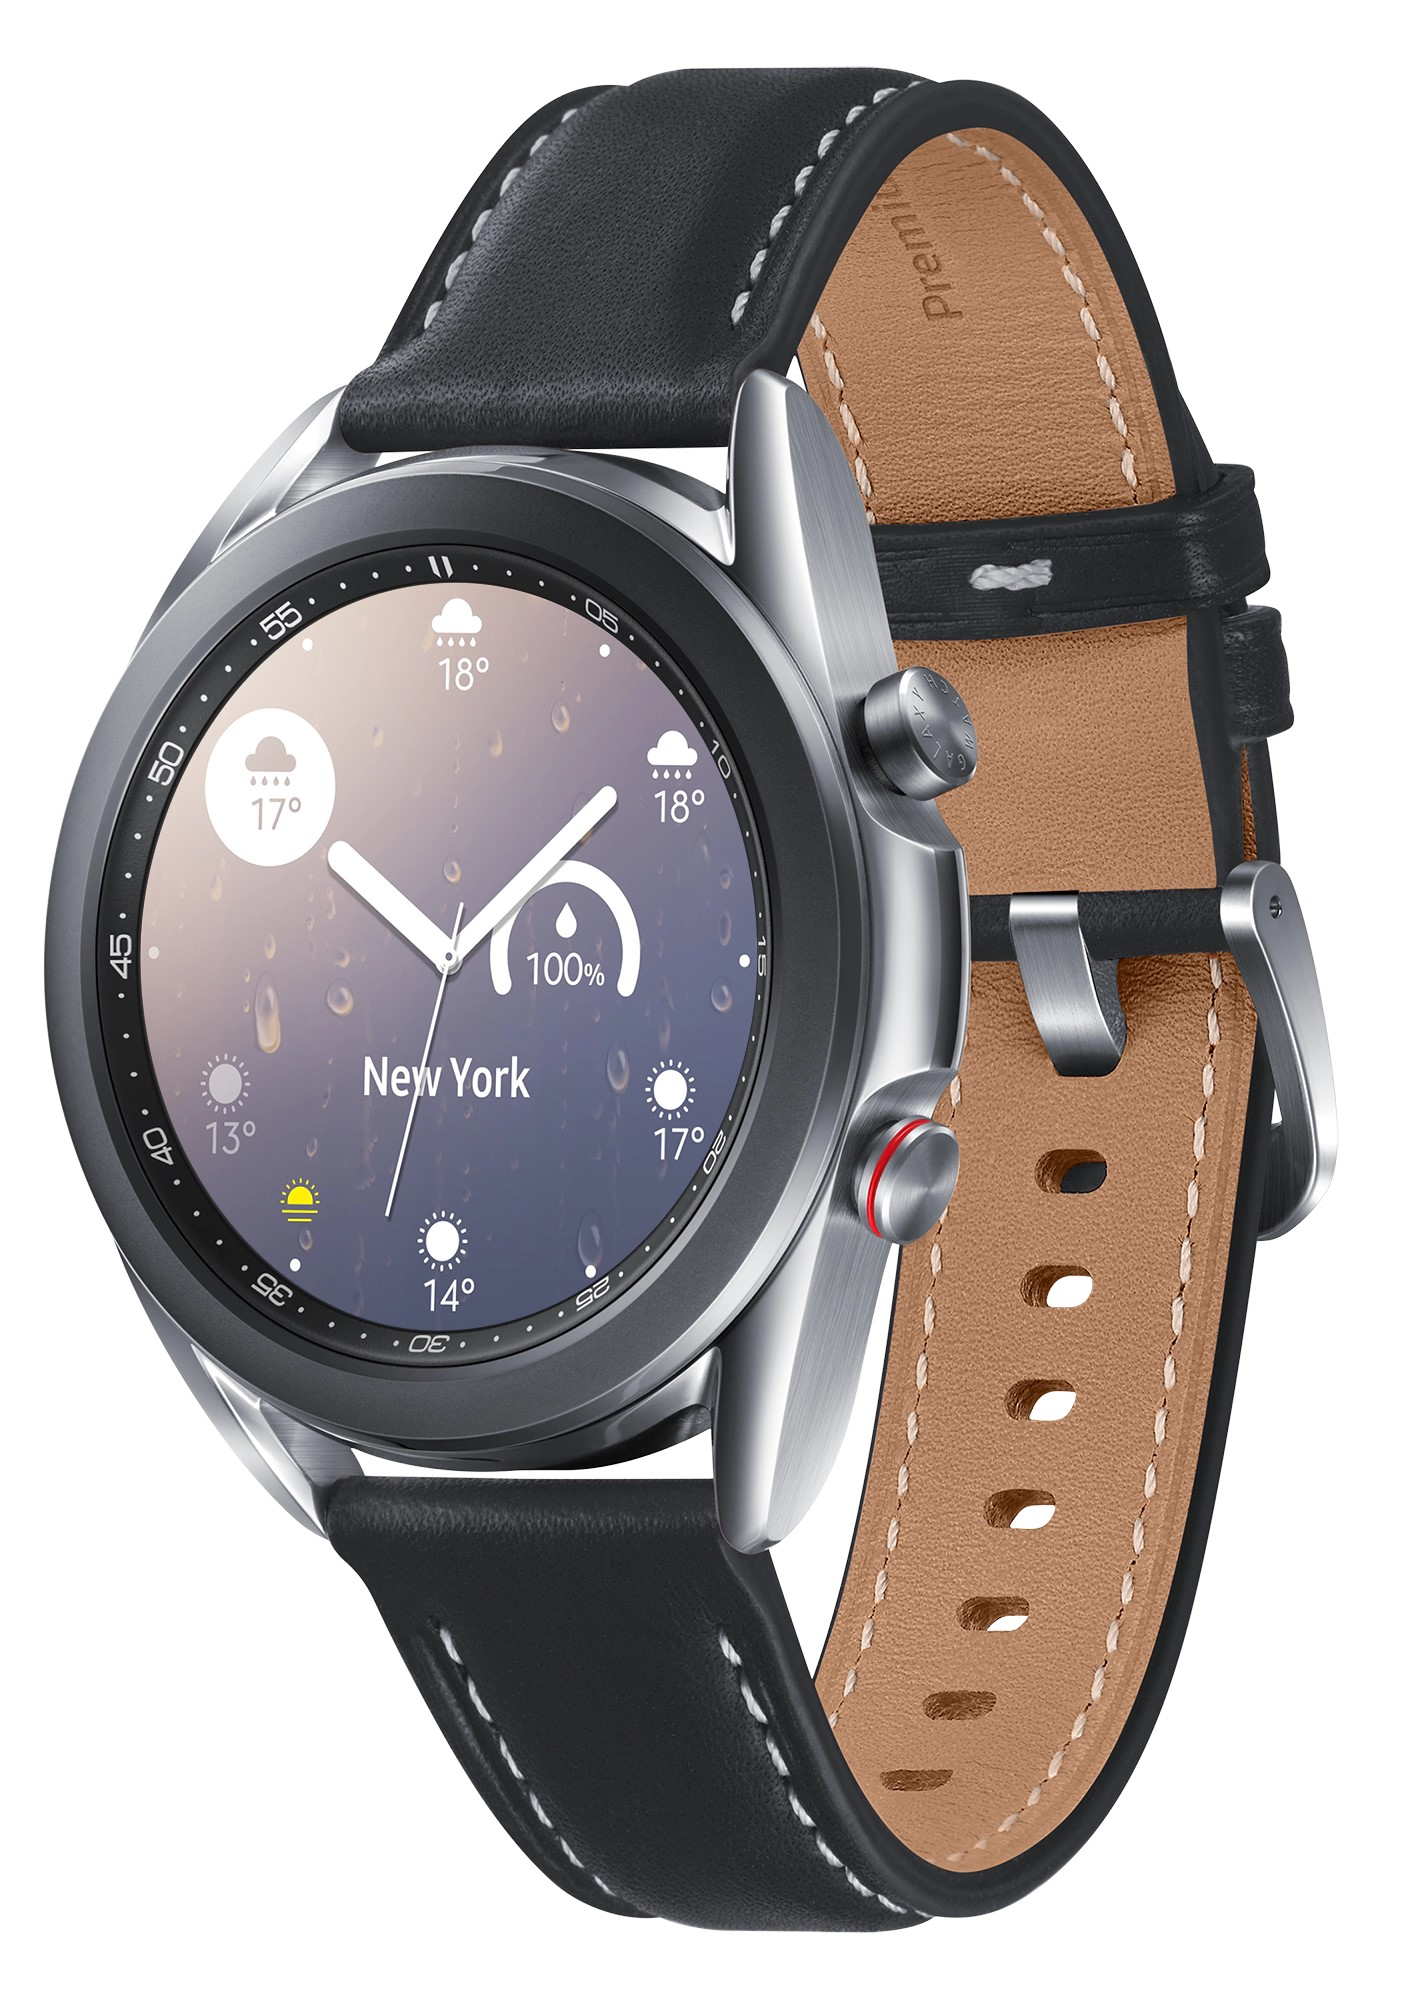 Samsung Galaxy Watch3 smartwatch